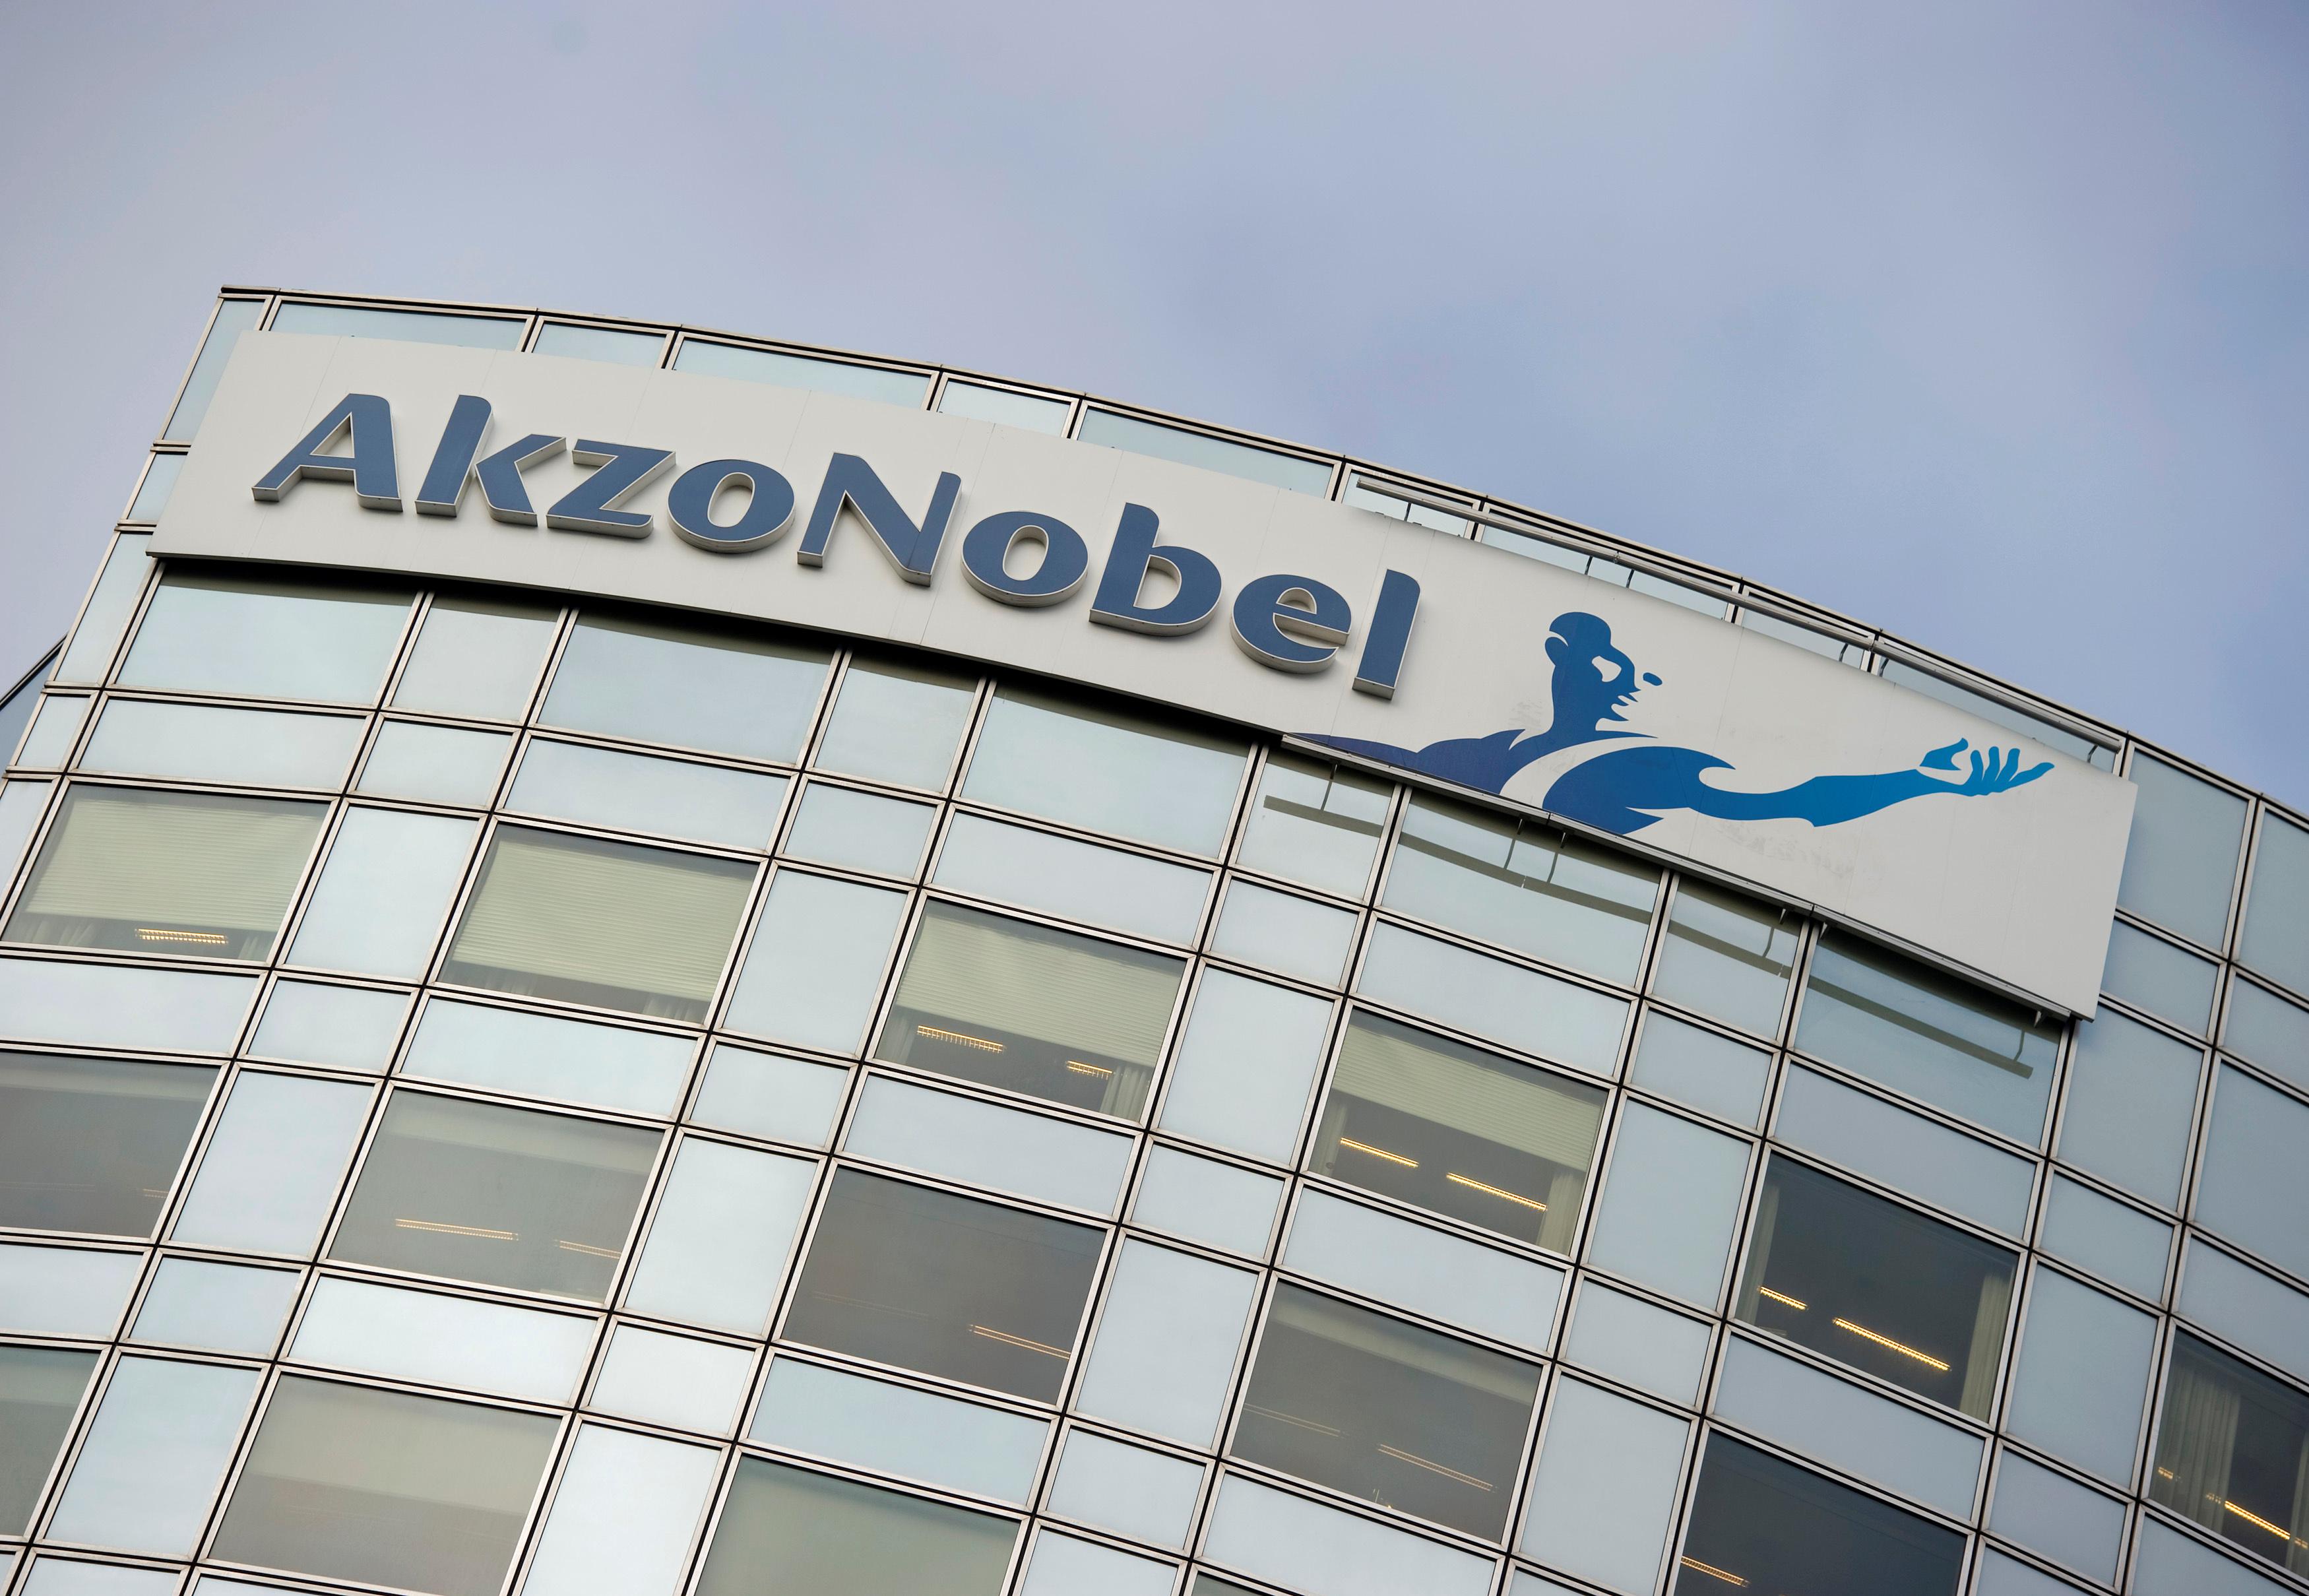 AkzoNobel's logo is seen in Amsterdam, Netherlands, February 16, 2012. REUTERS/Robin van Lonkhuijsen